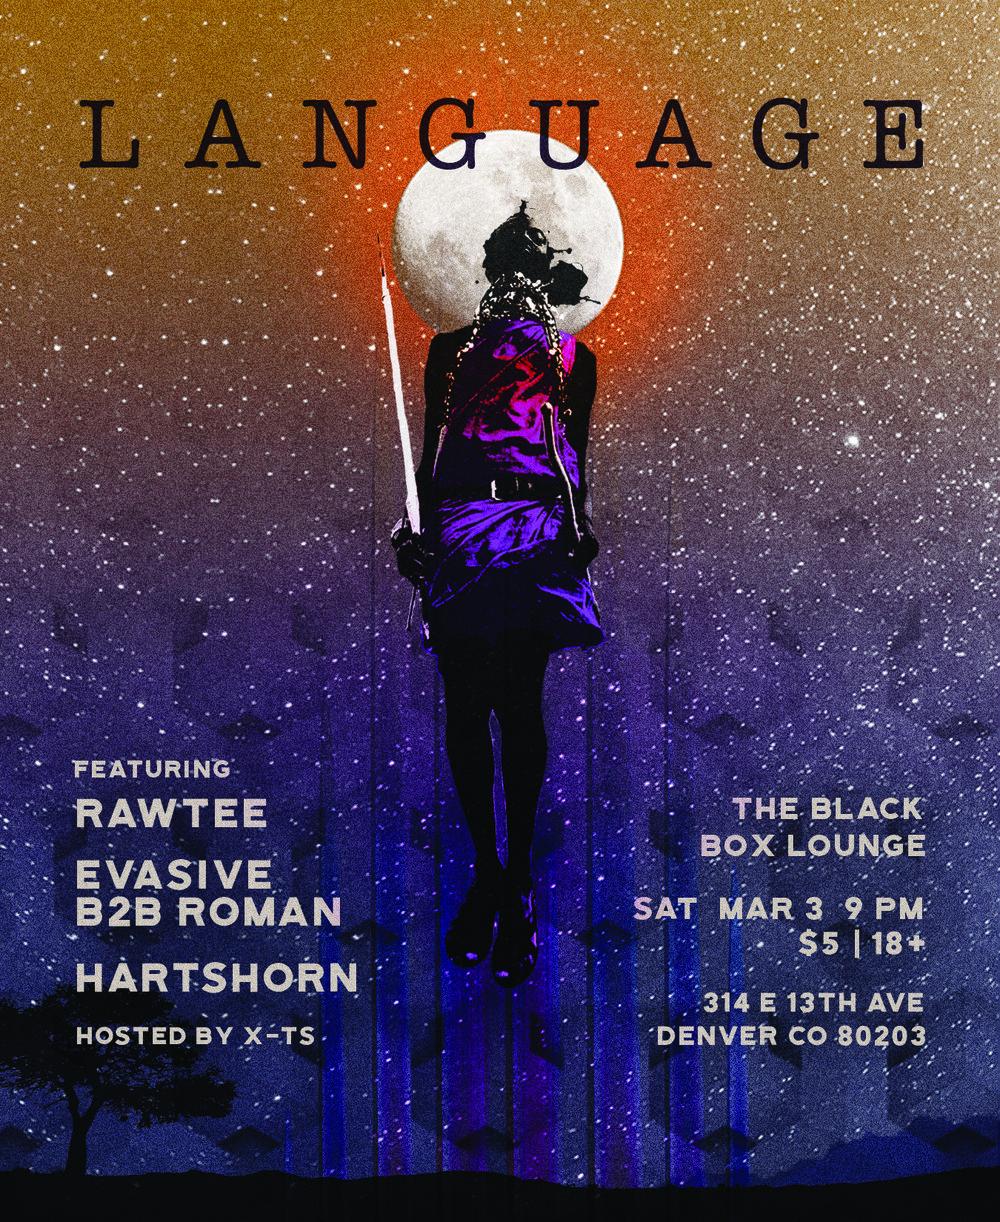 Language 039 -Rawtee / Evasive b2b Roman / Hartshorn